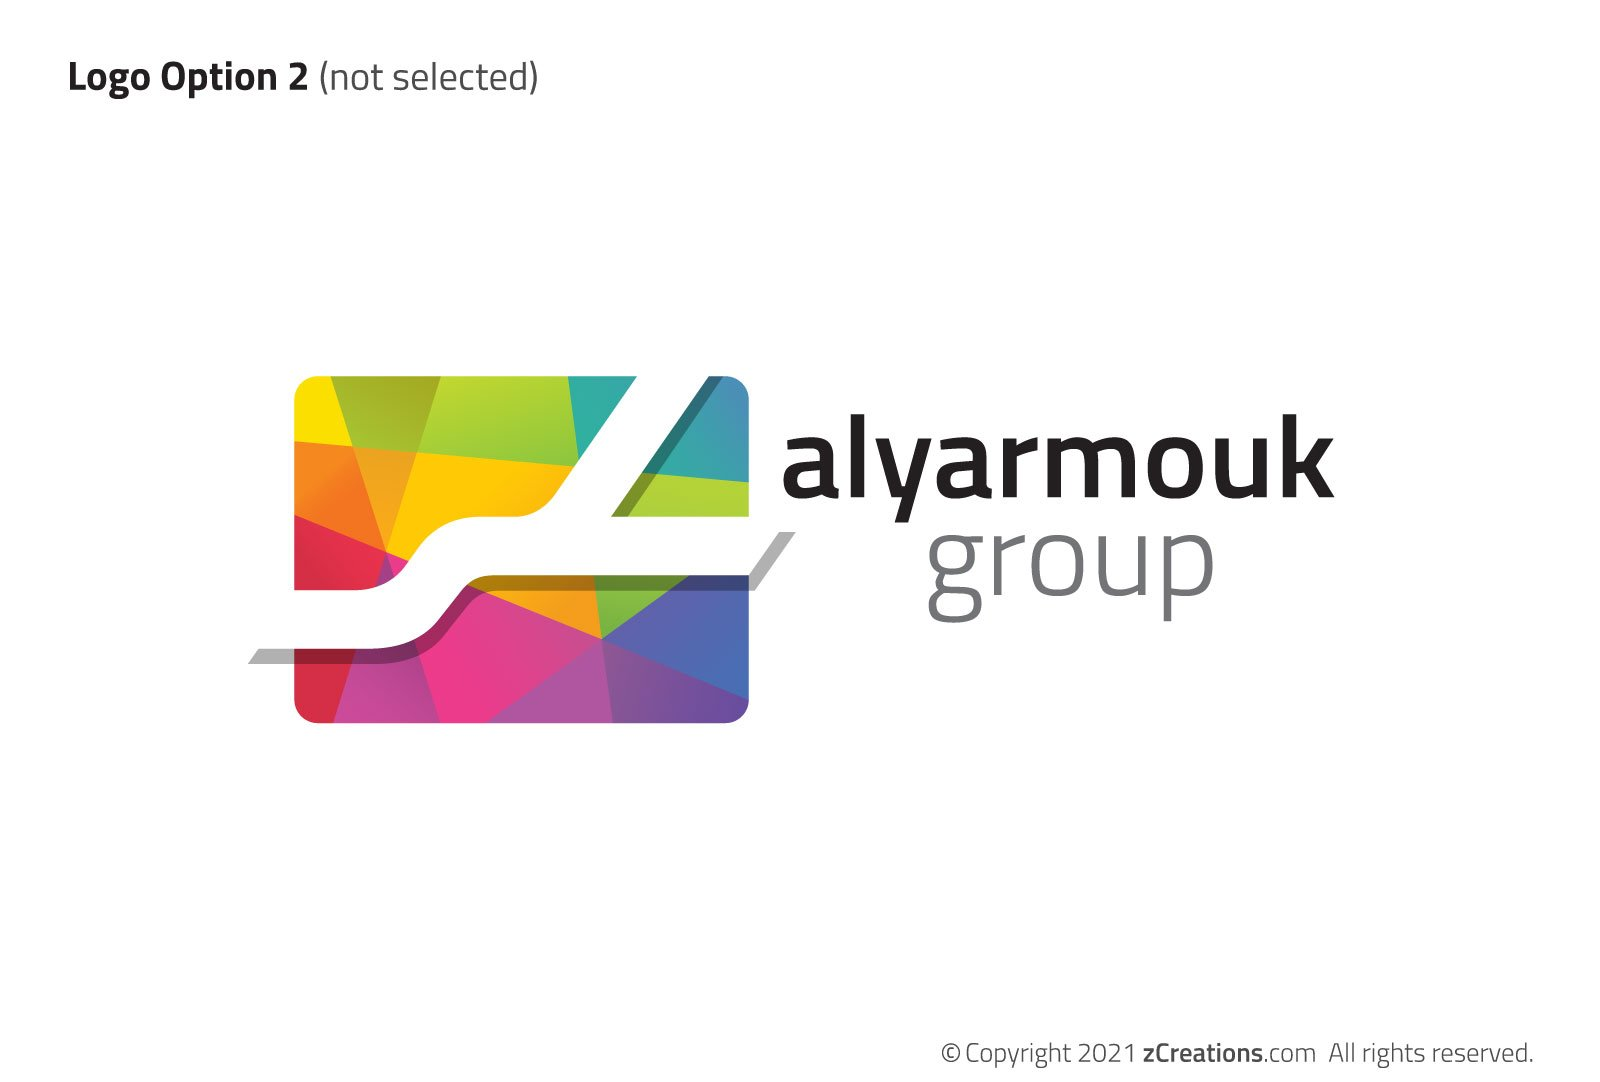 Alyarmouk Group Alternate Logo Design